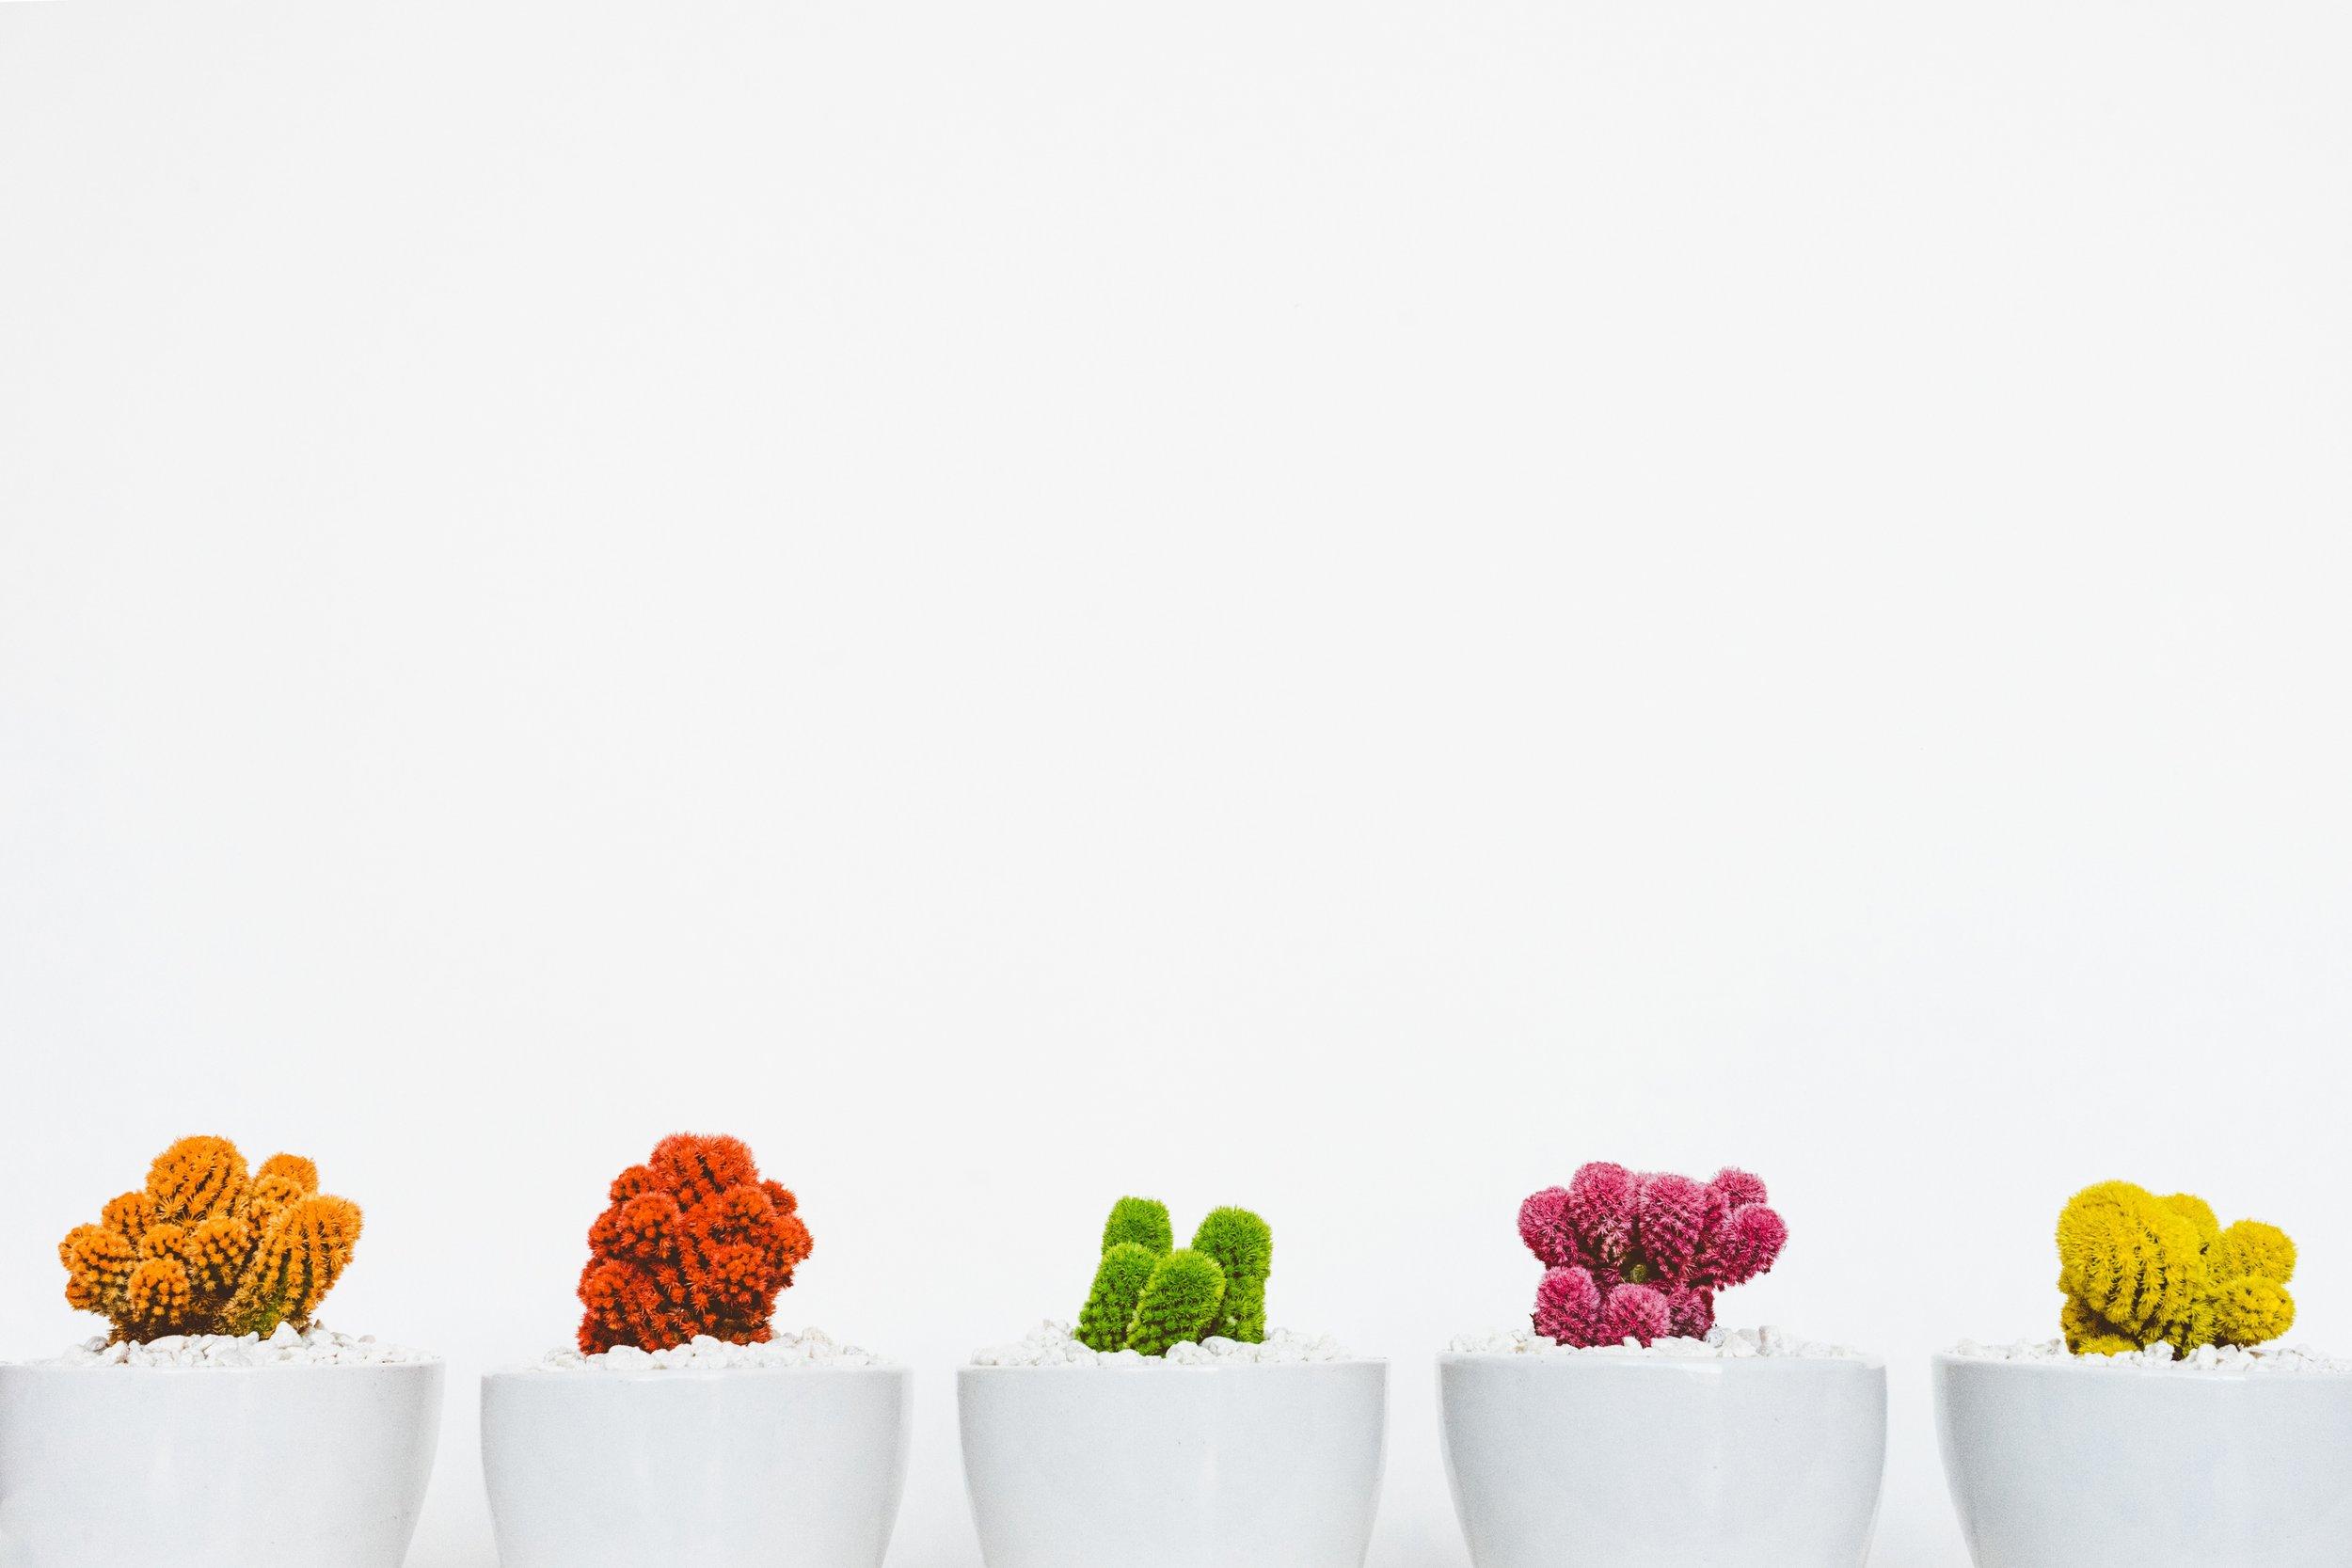 RG colorful plants .jpg